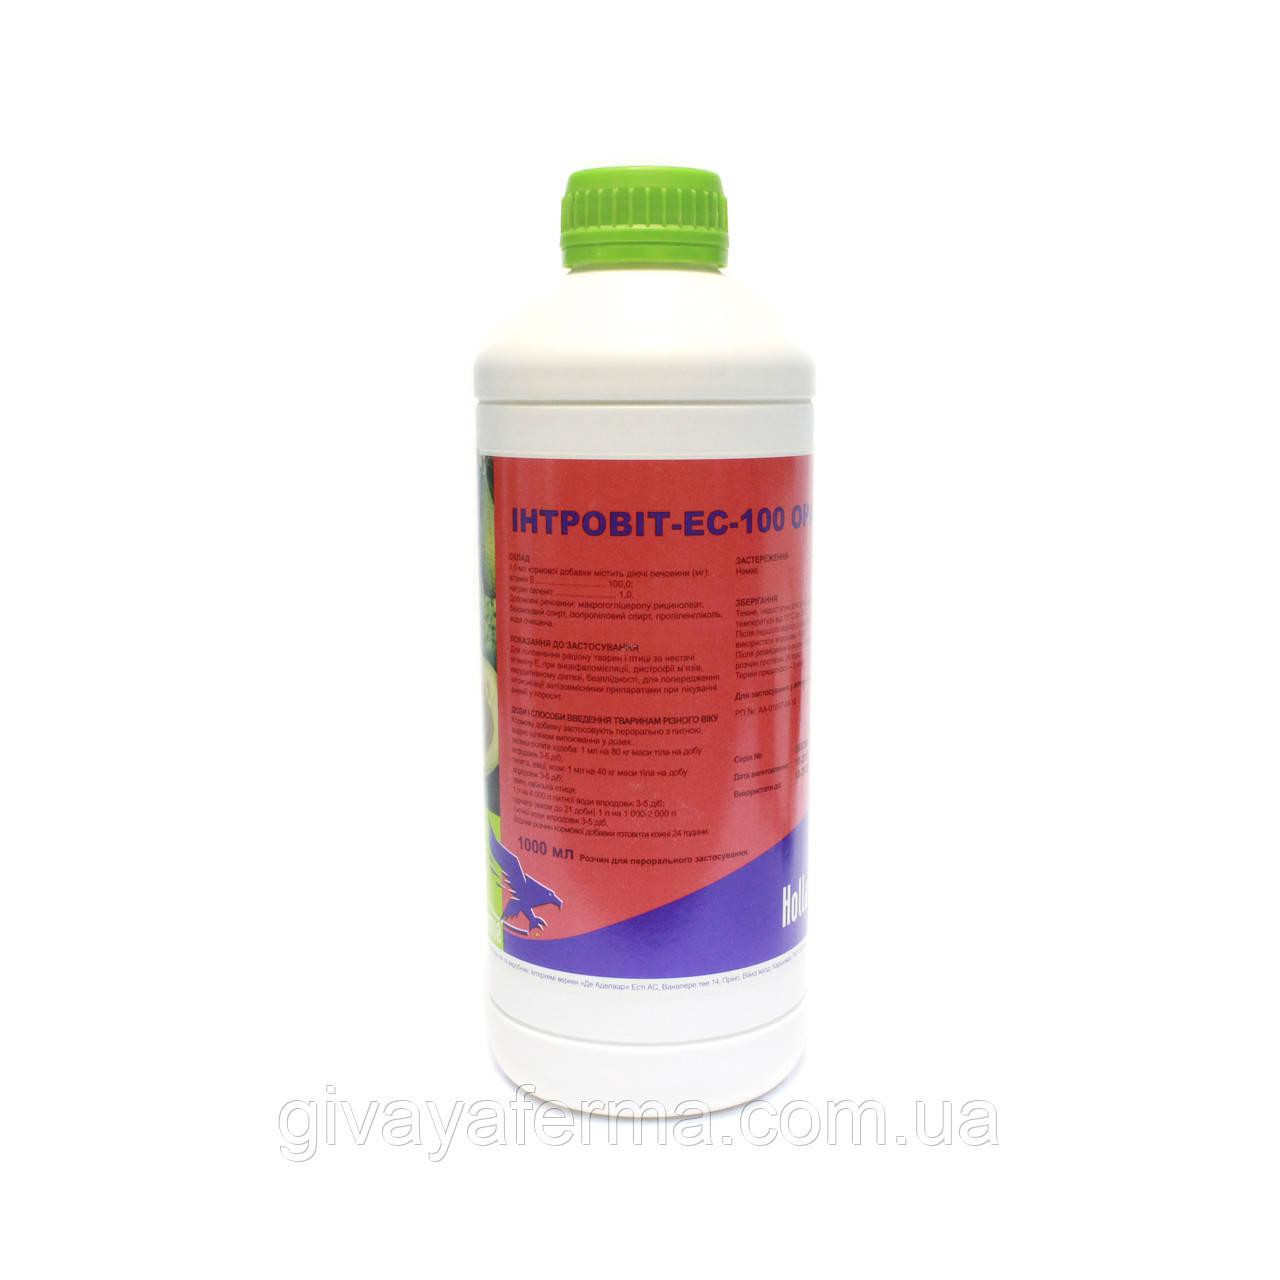 Интровит ES-100 Орал 1 л, витамин Е + Селен, для животных и птиц, Интерхим